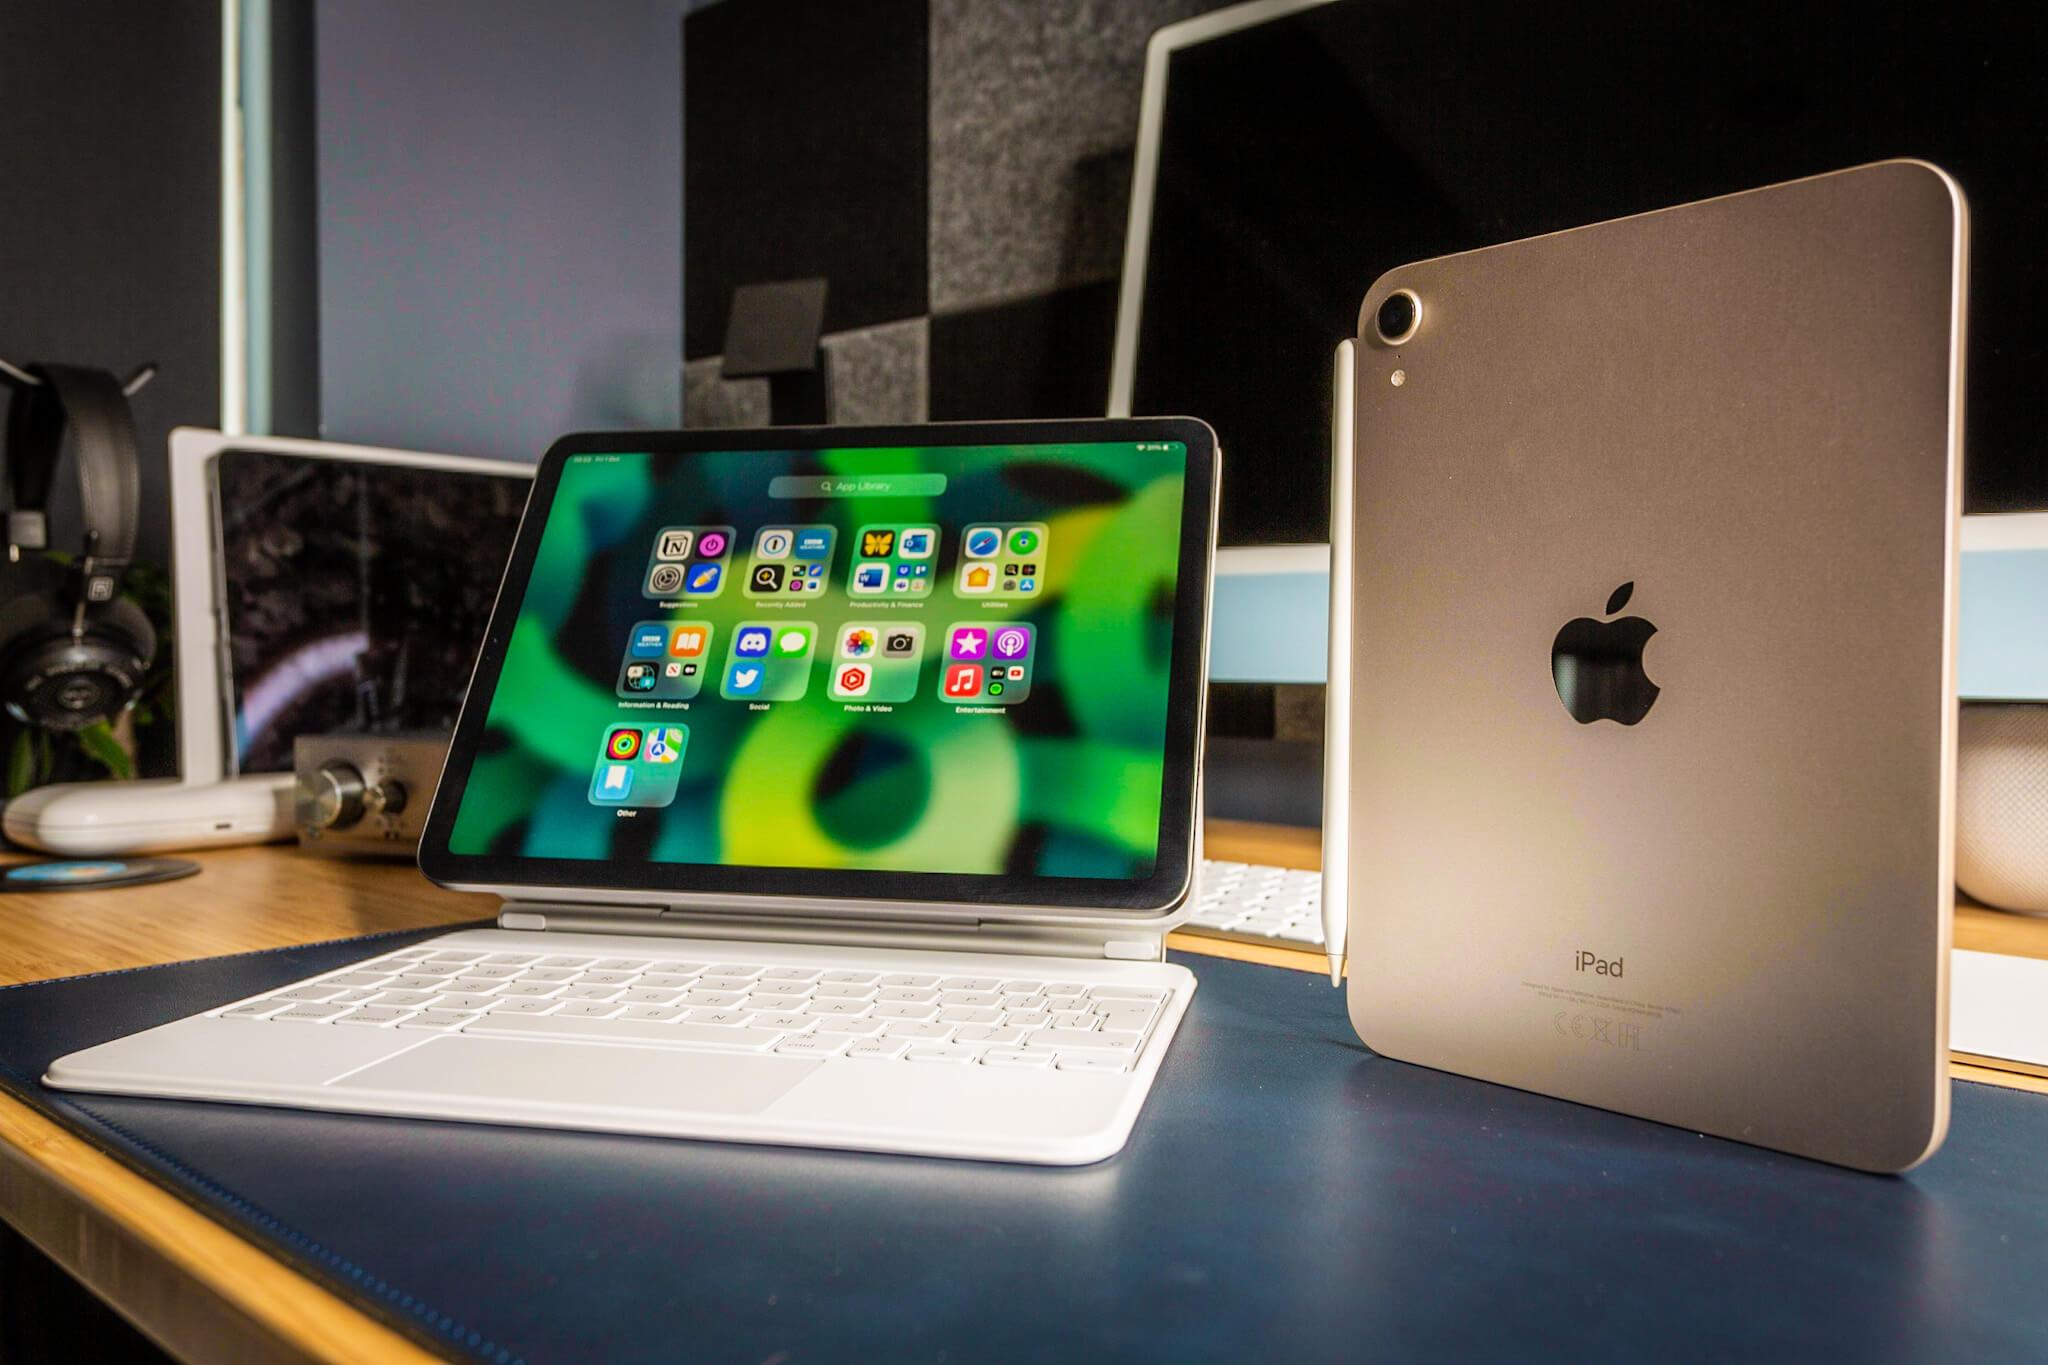 iPad mini 6 vs iPad Air 4: Which Is Better?